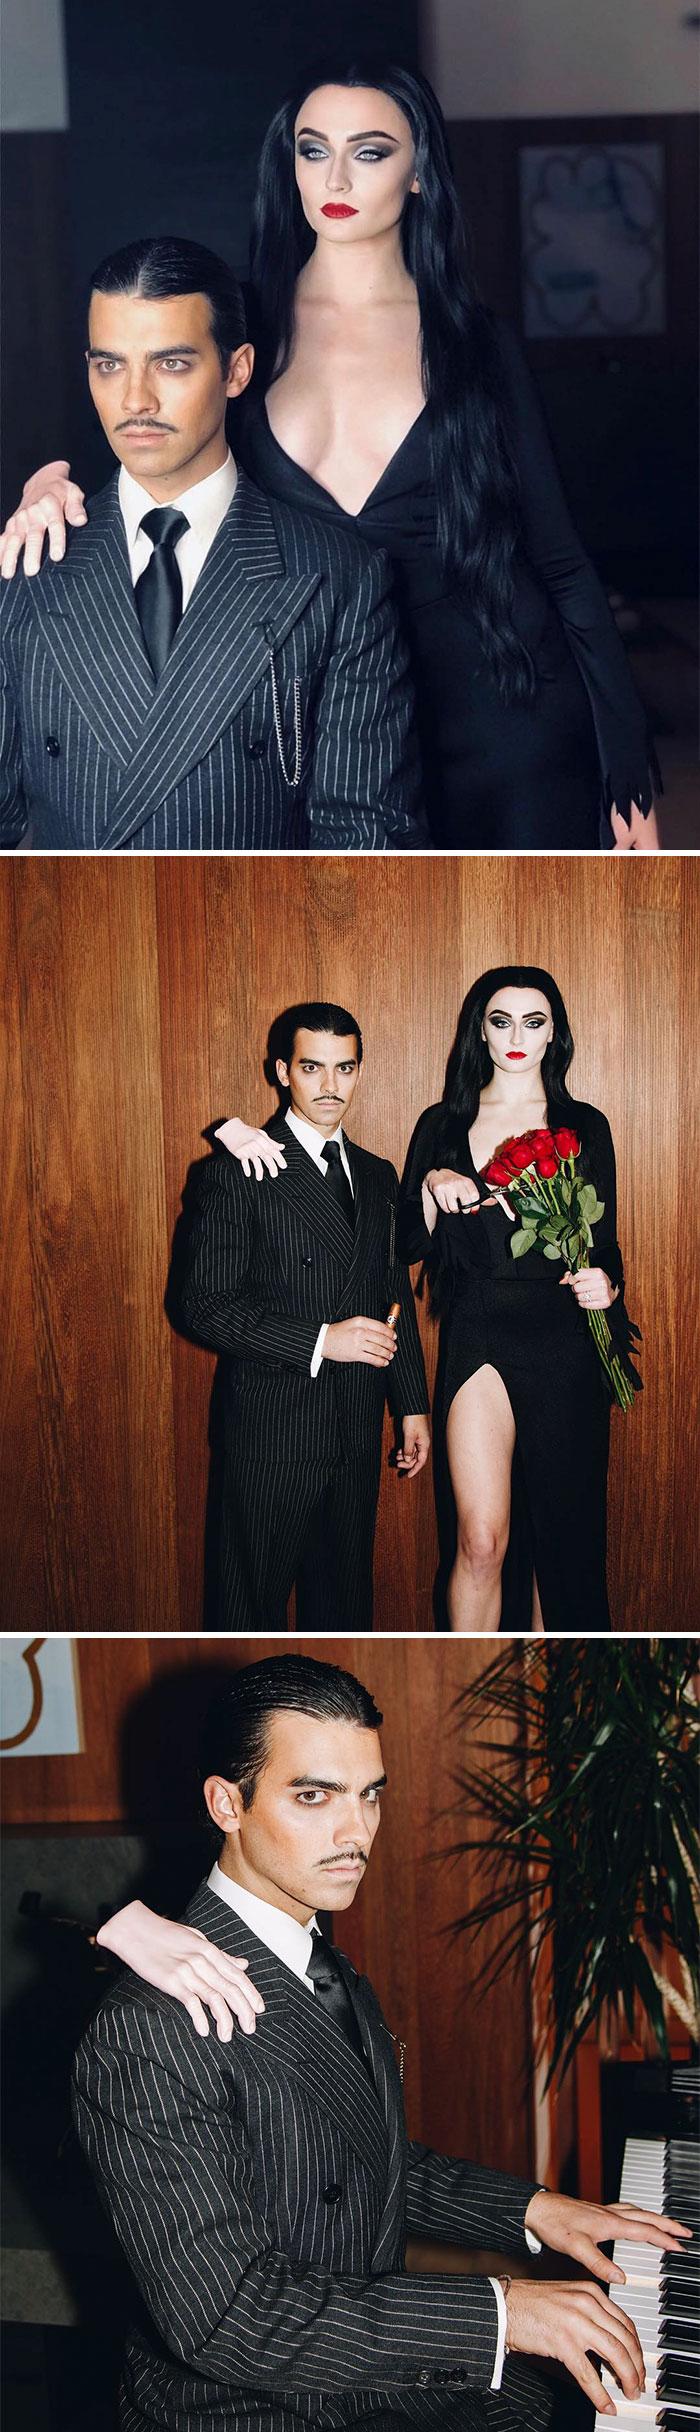 Sophie Turner And Joe Jonas As Morticia And Gomez Addams